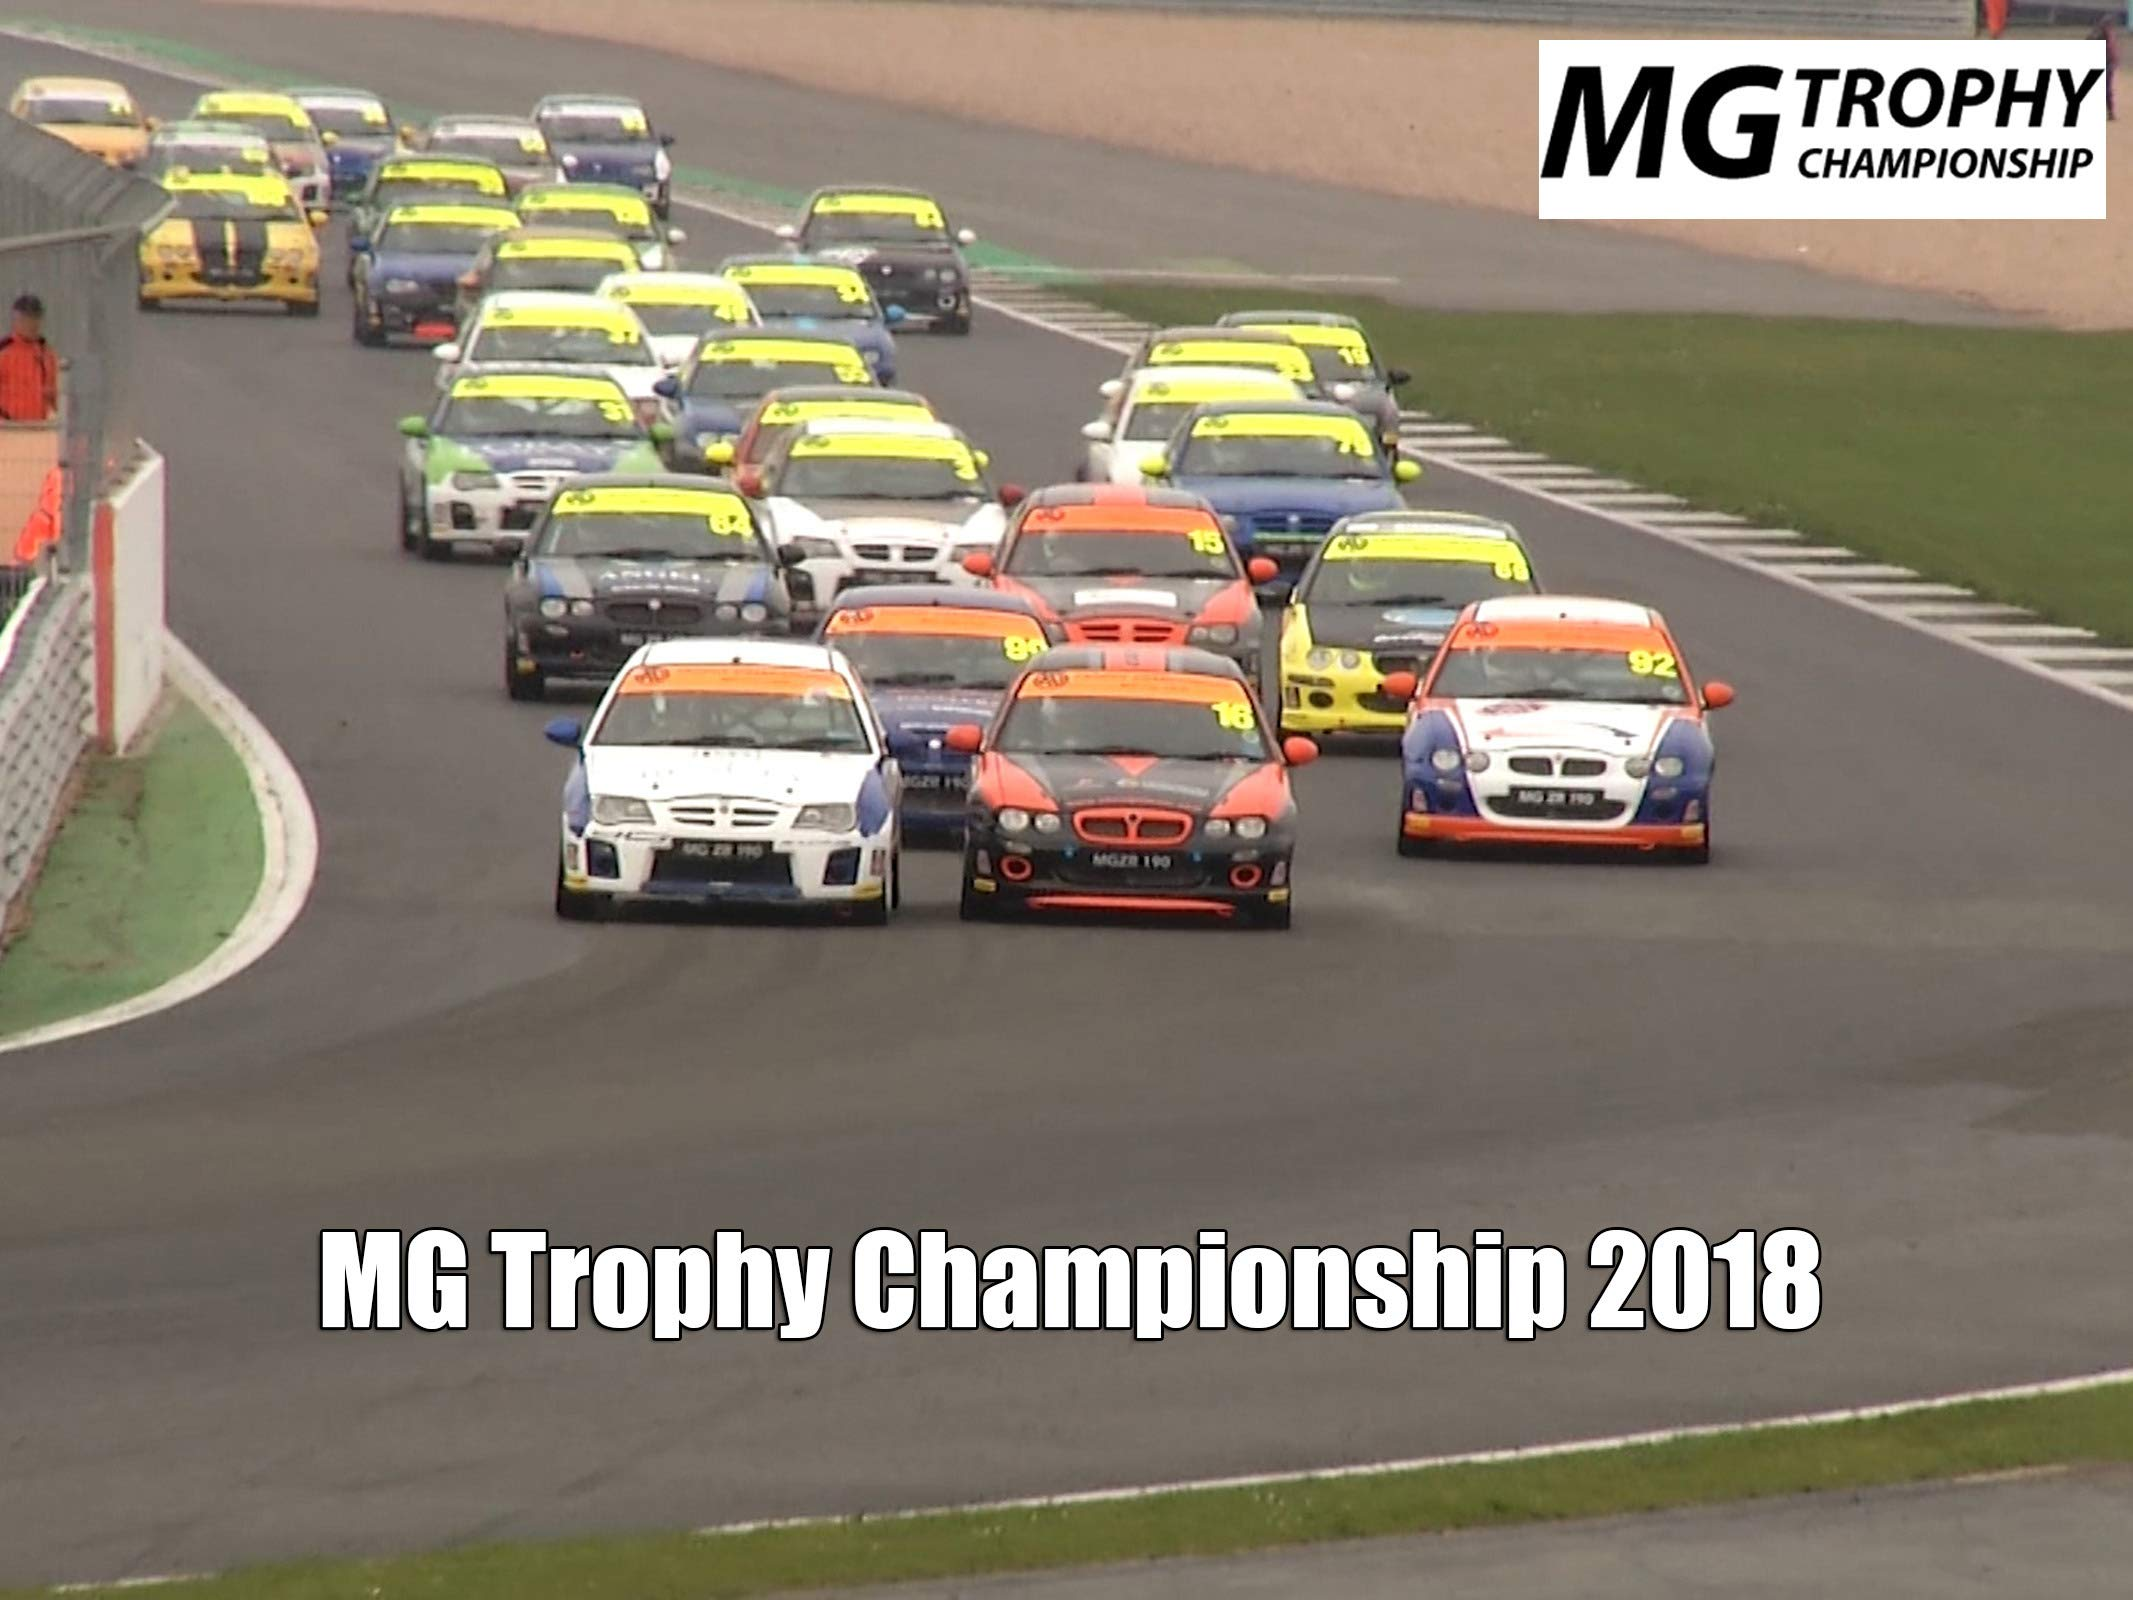 MG Trophy Championship 2018 on Amazon Prime Video UK